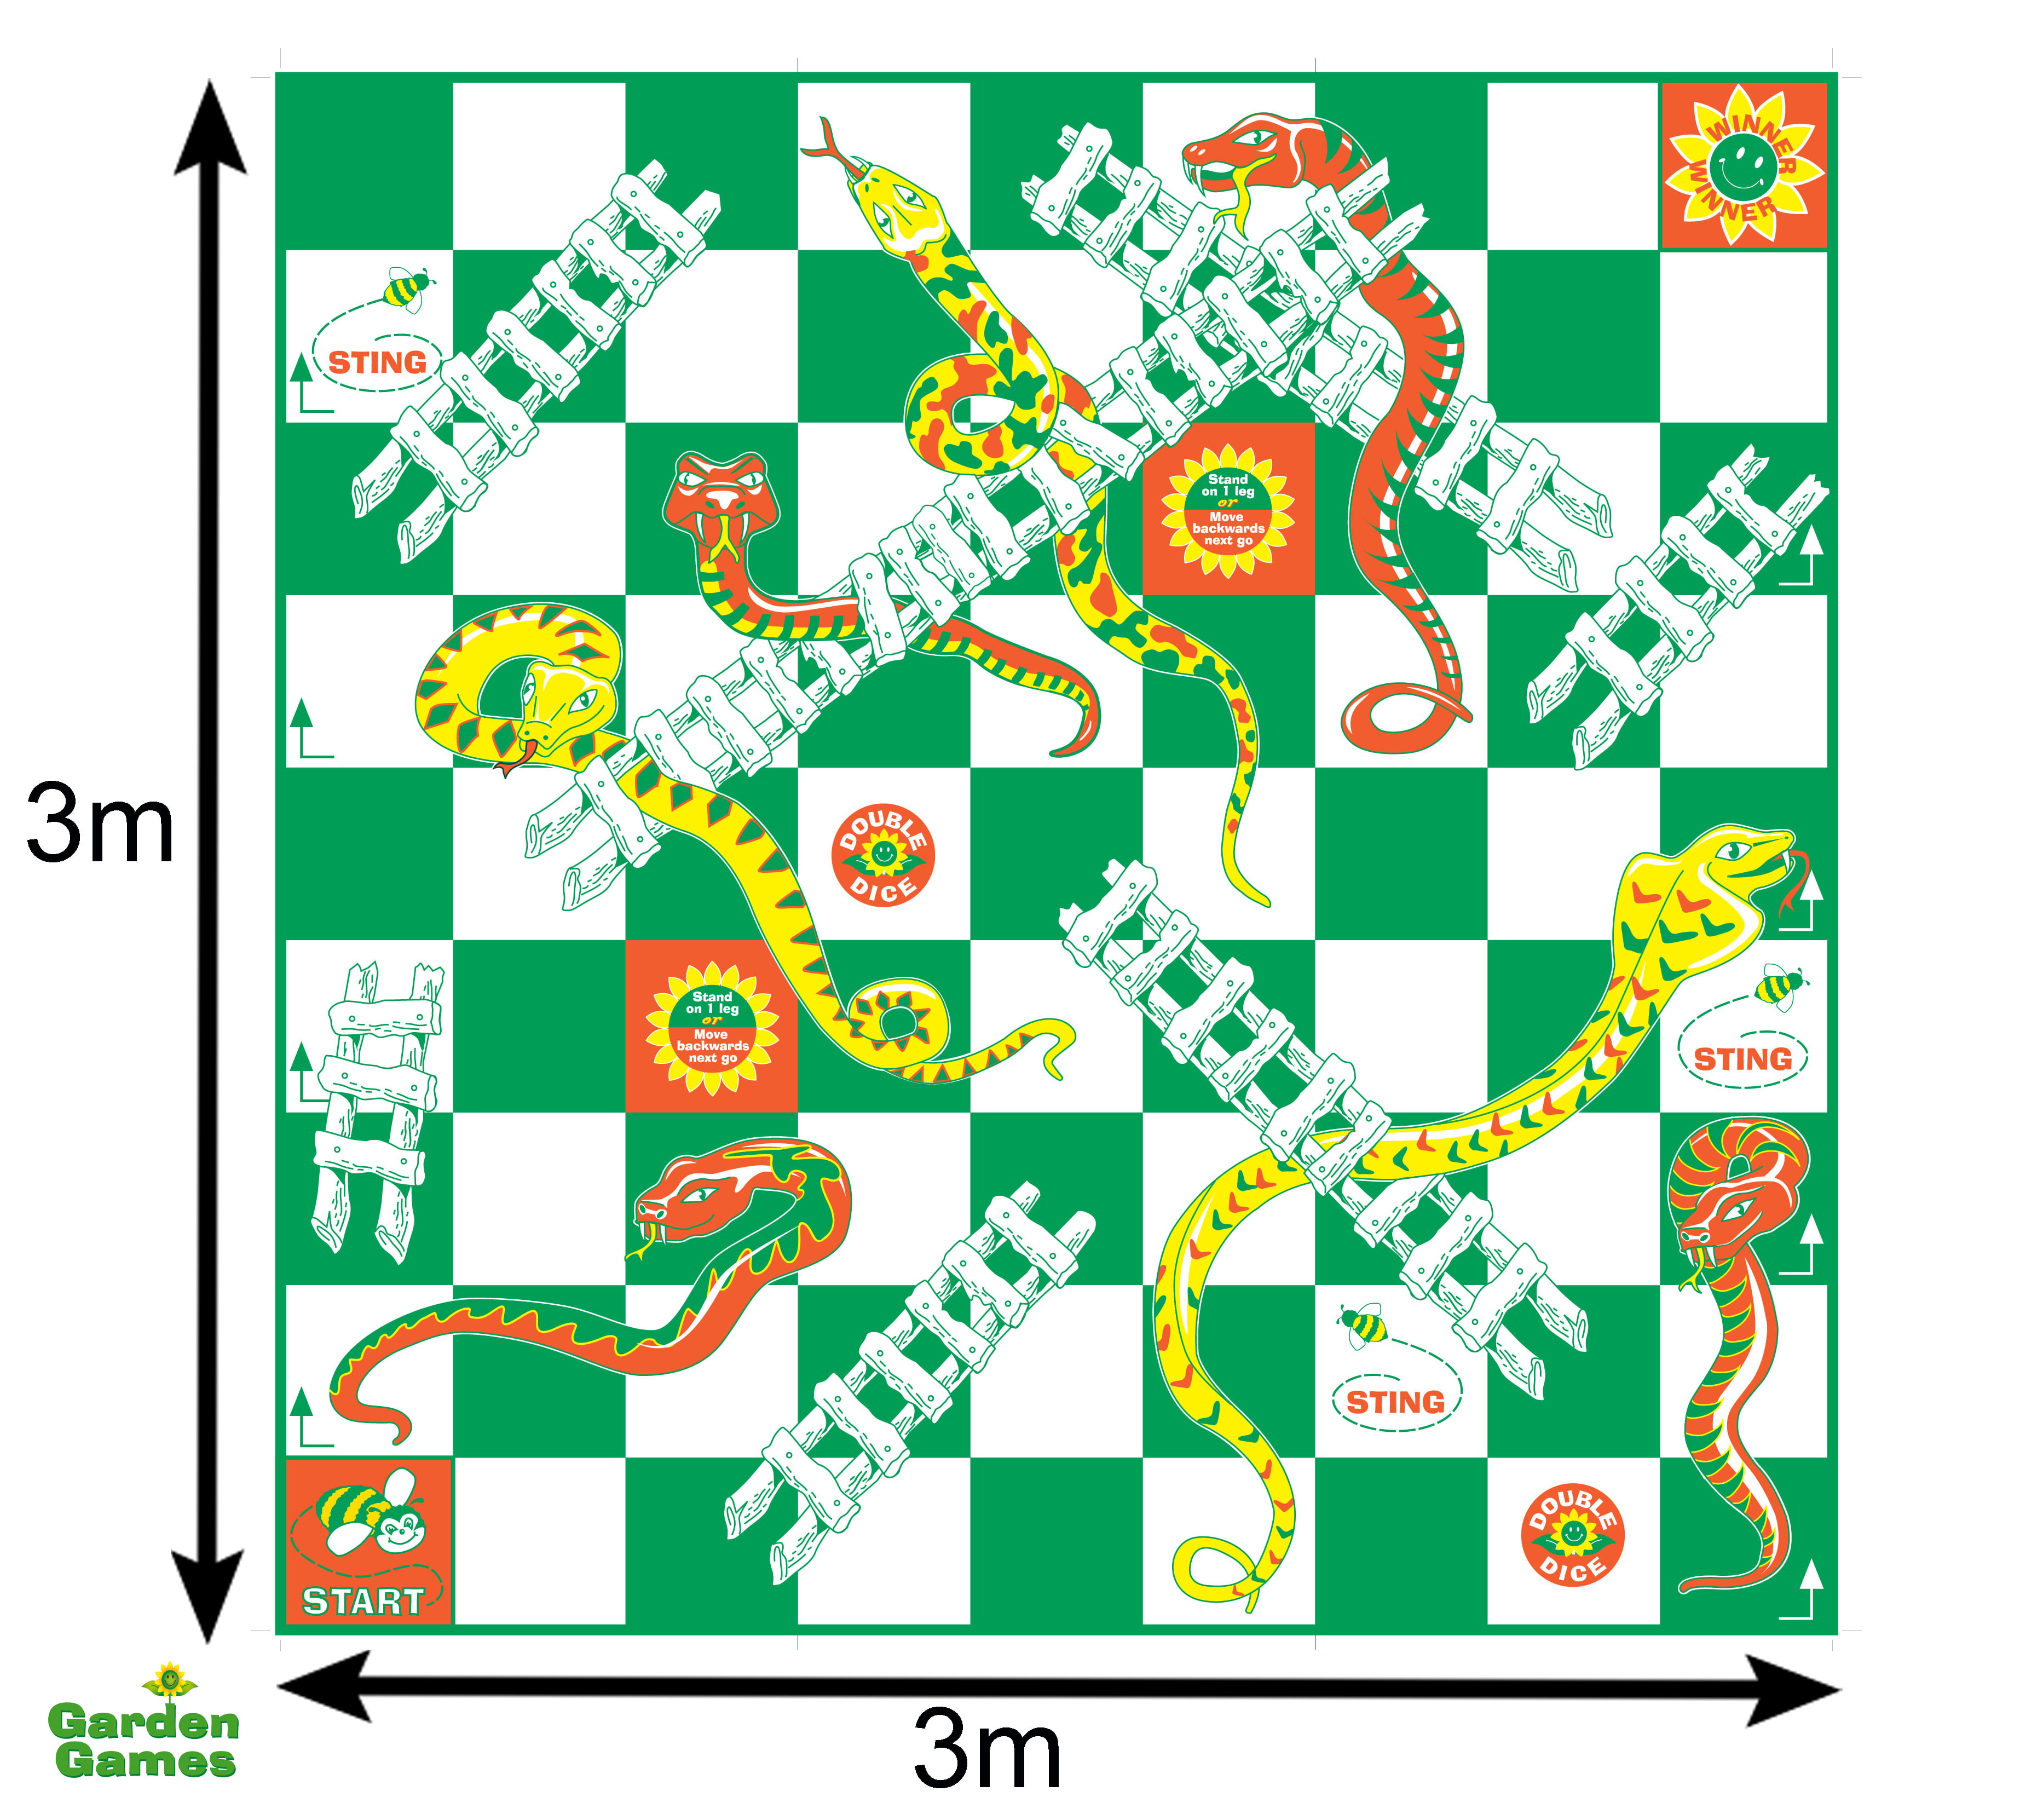 Adventure Zone Toys Garden Games Snakes & Ladders